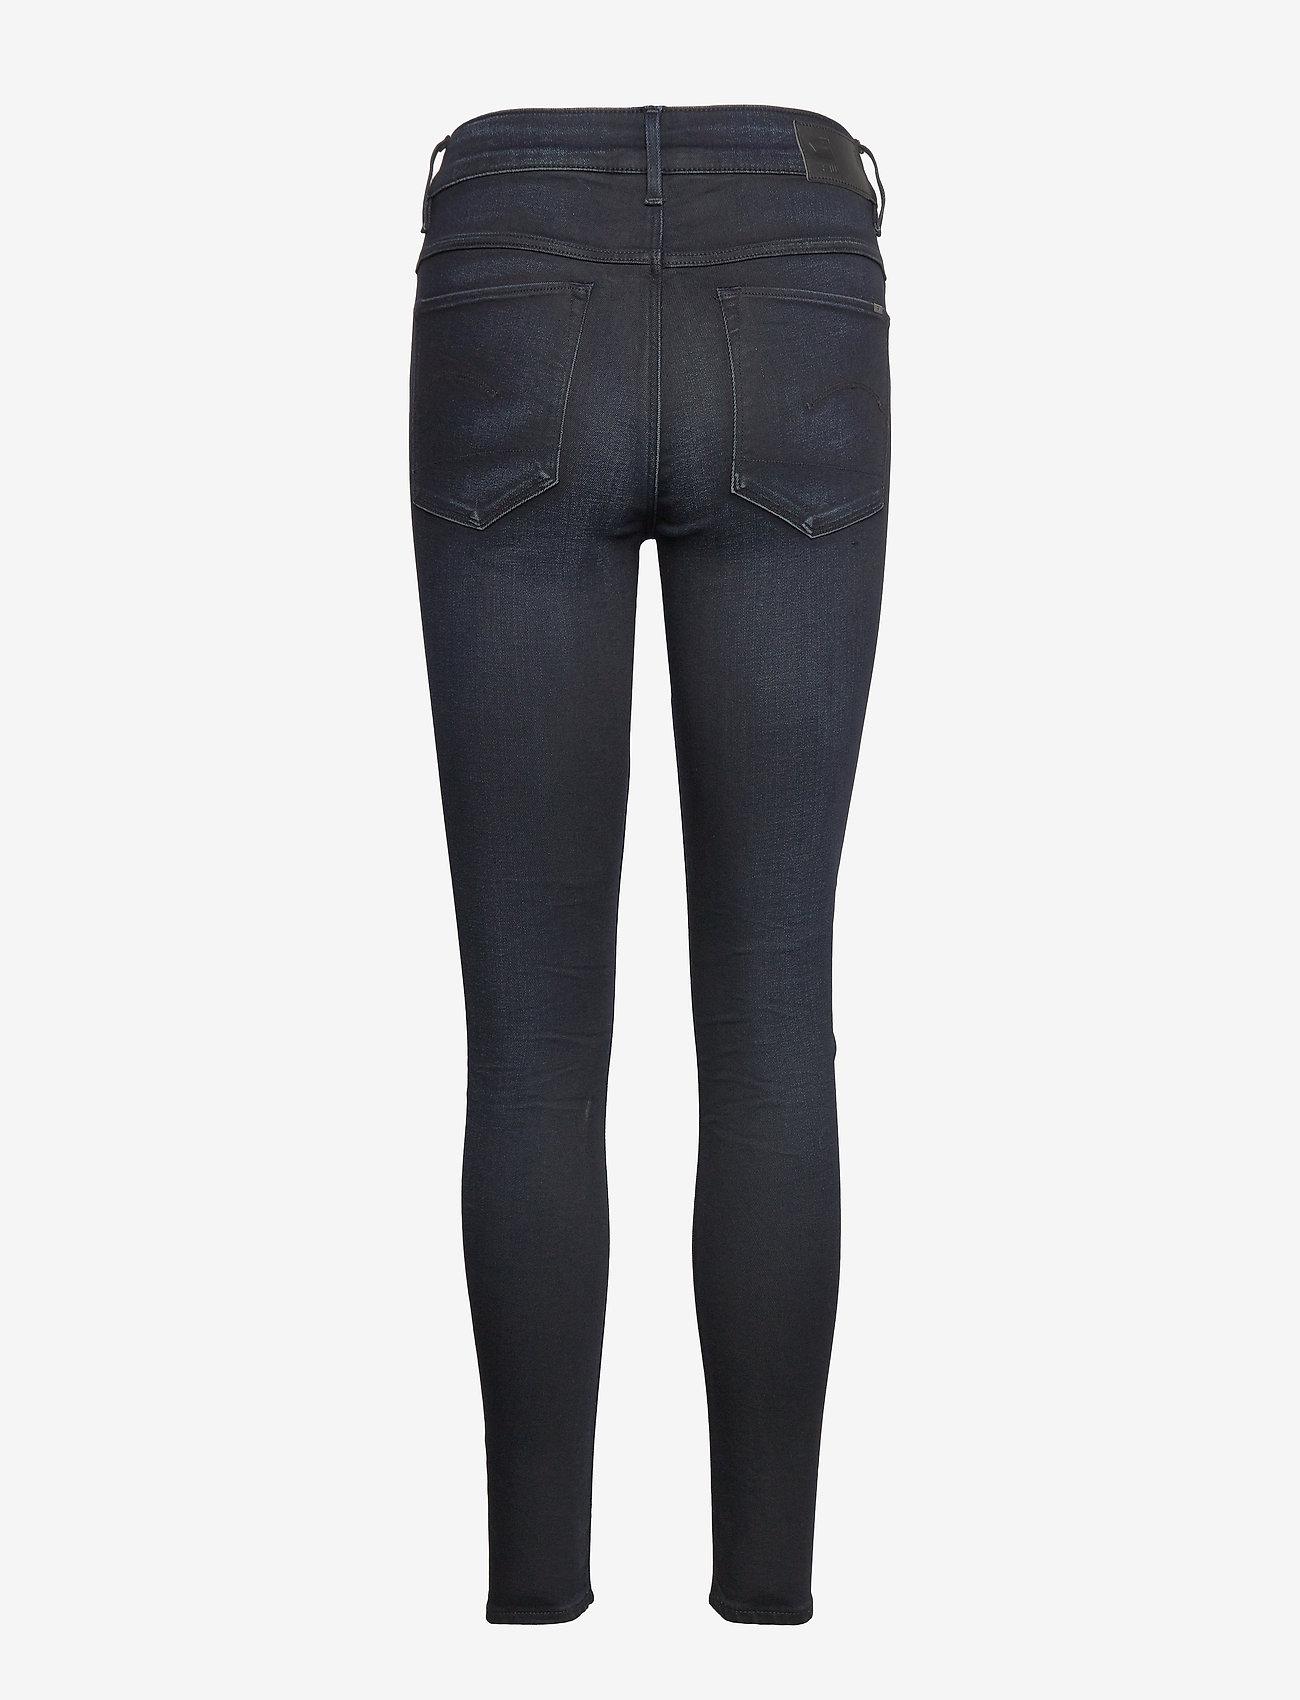 G-star RAW - 3301 High Skinny Wmn - skinny jeans - dk aged - 1